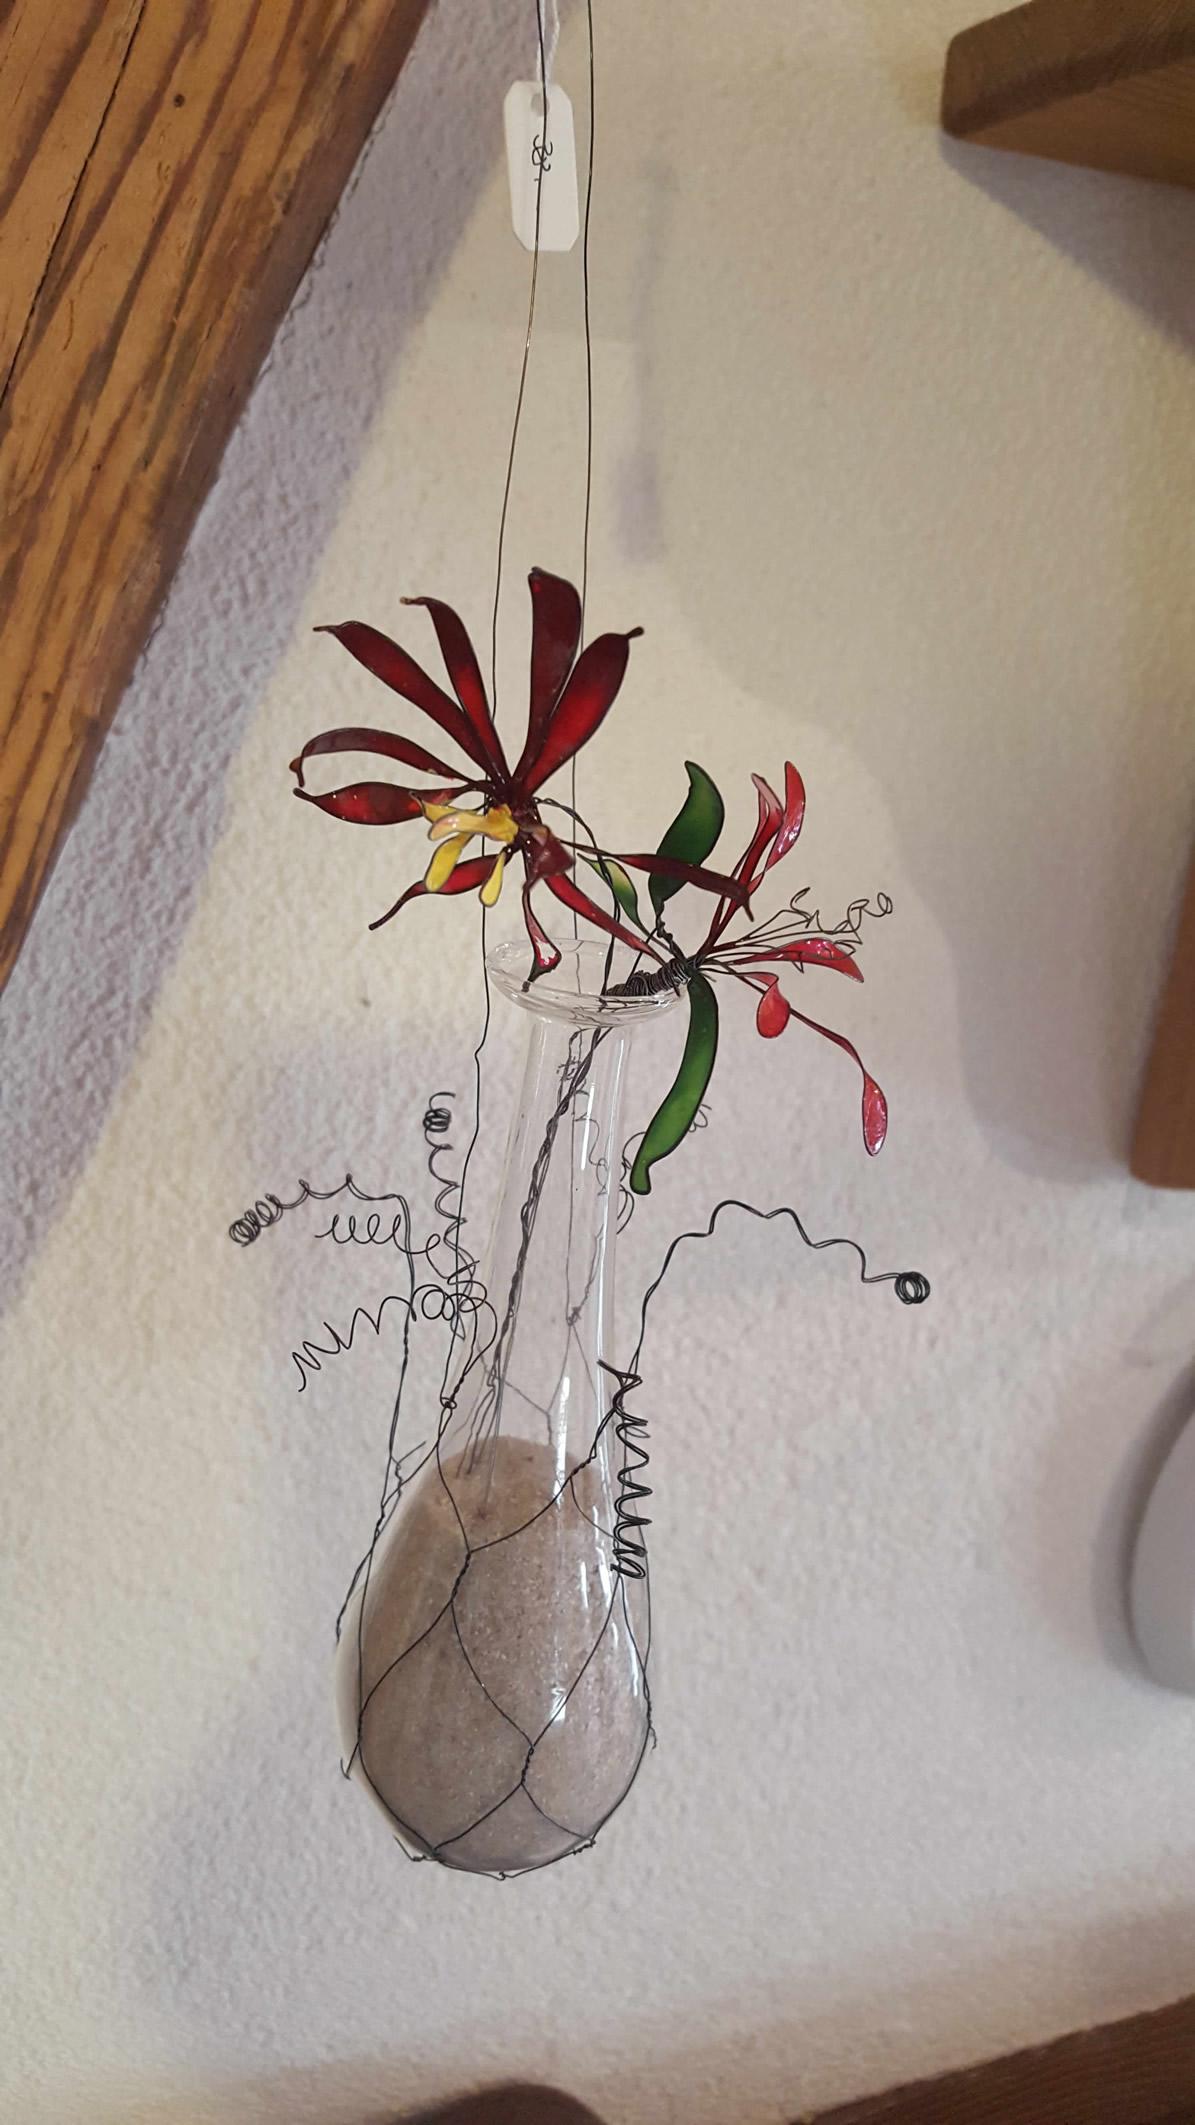 Berühmt Drahtblumenmuster Galerie - Elektrische Schaltplan-Ideen ...